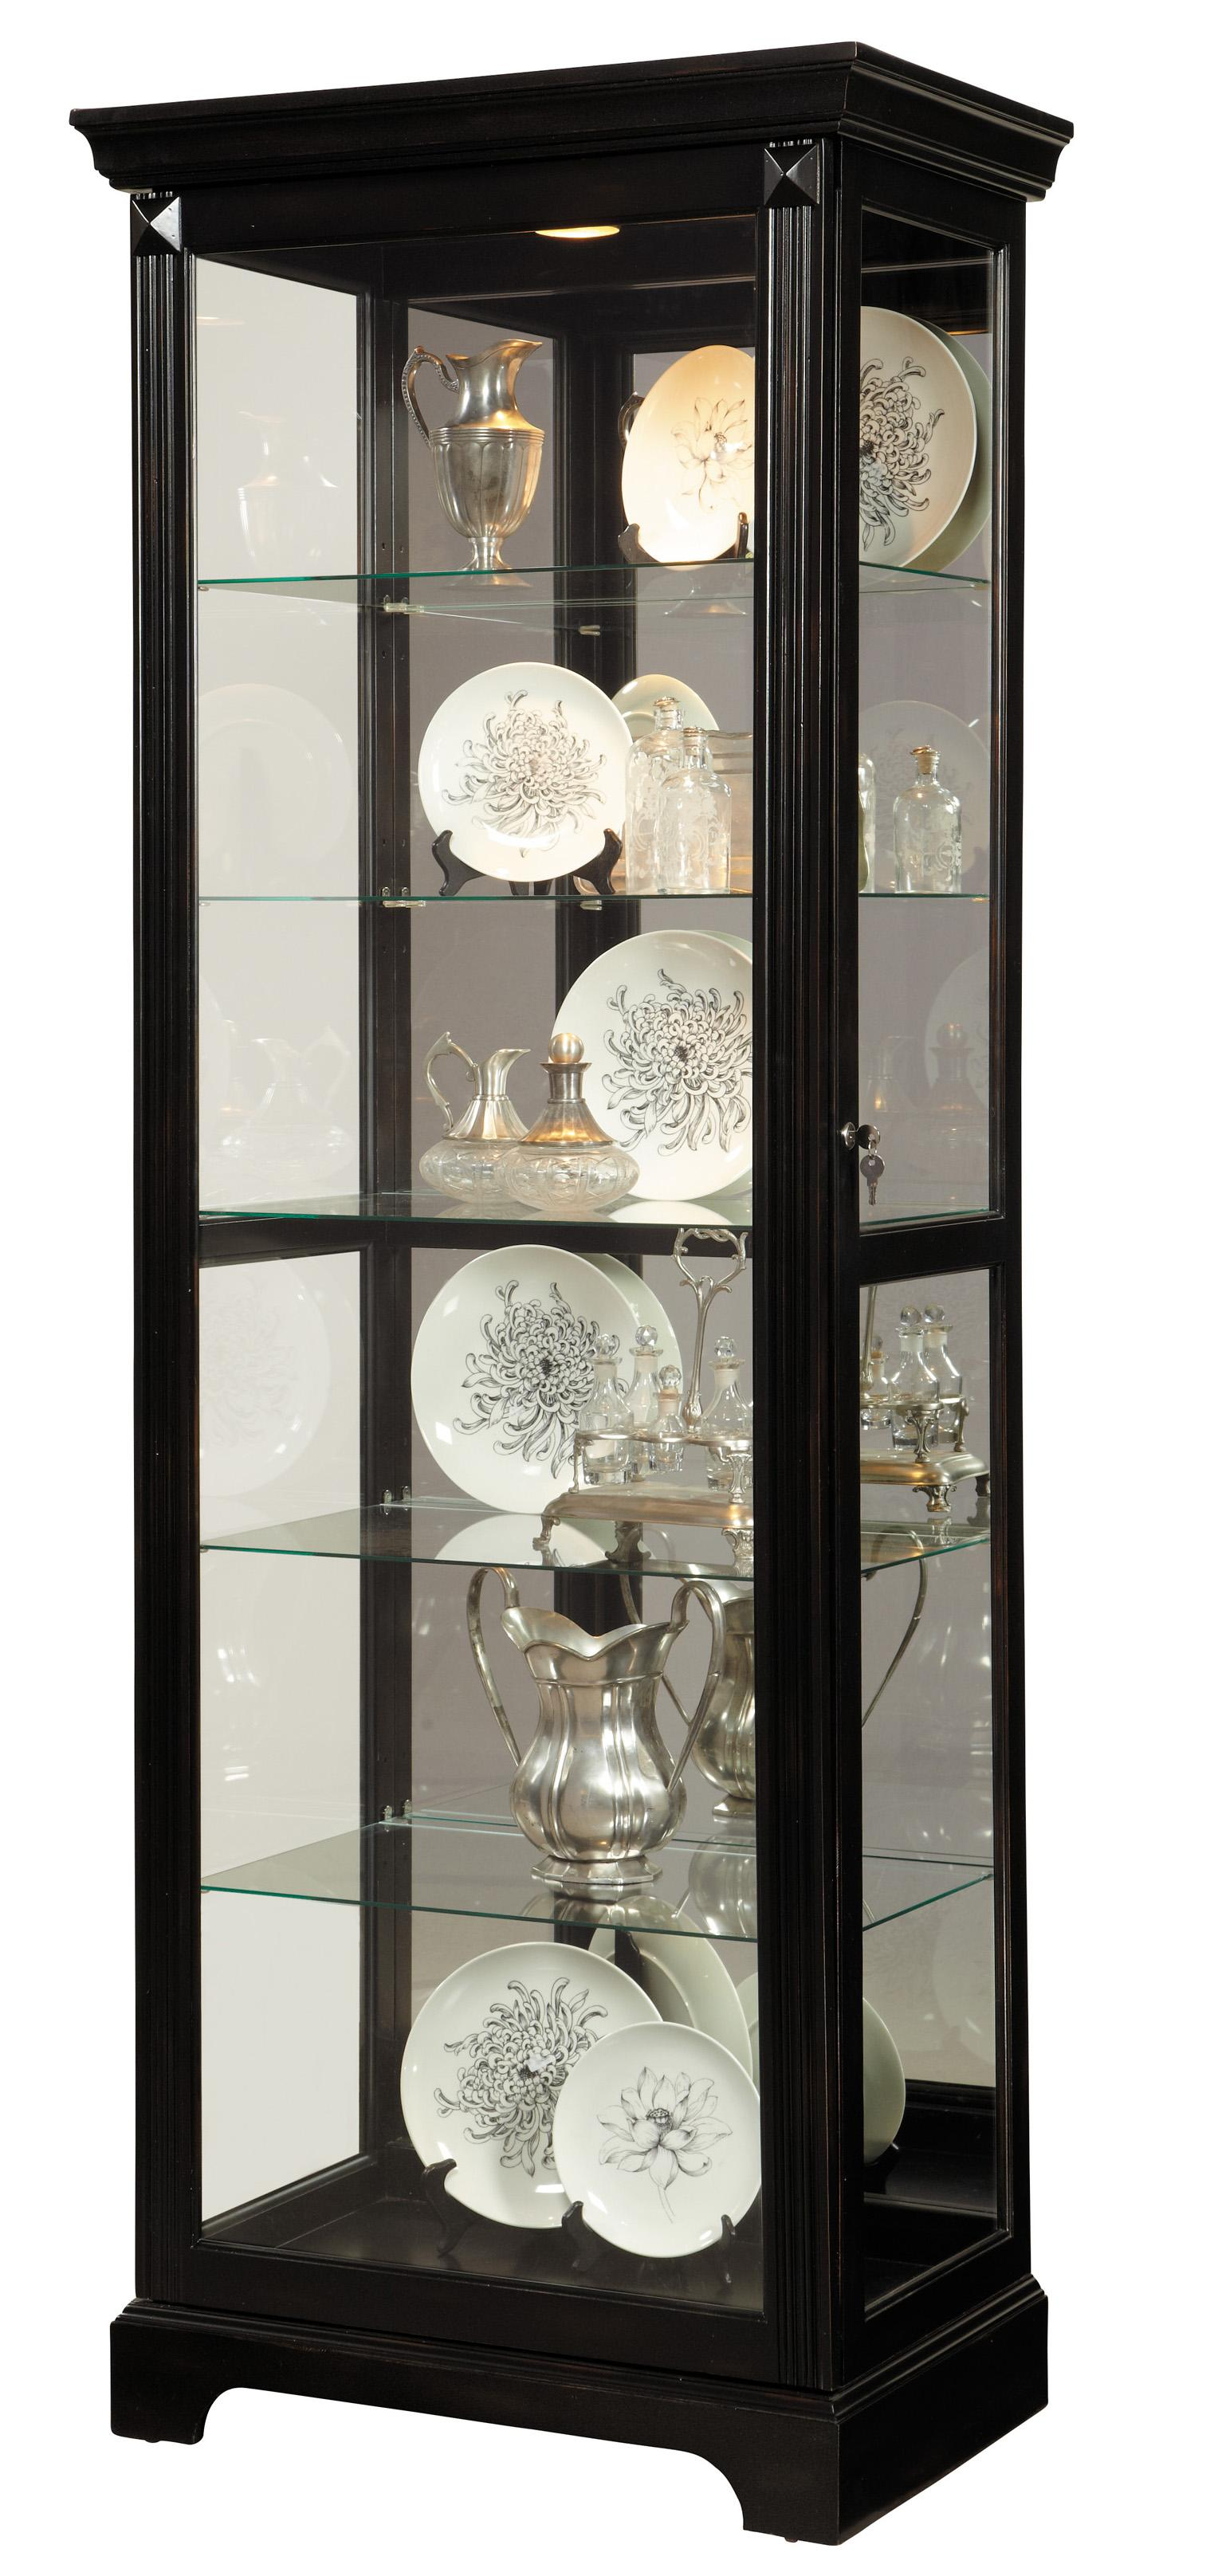 Pulaski furniture curios lit curio w mirror backing for Pulaski furniture